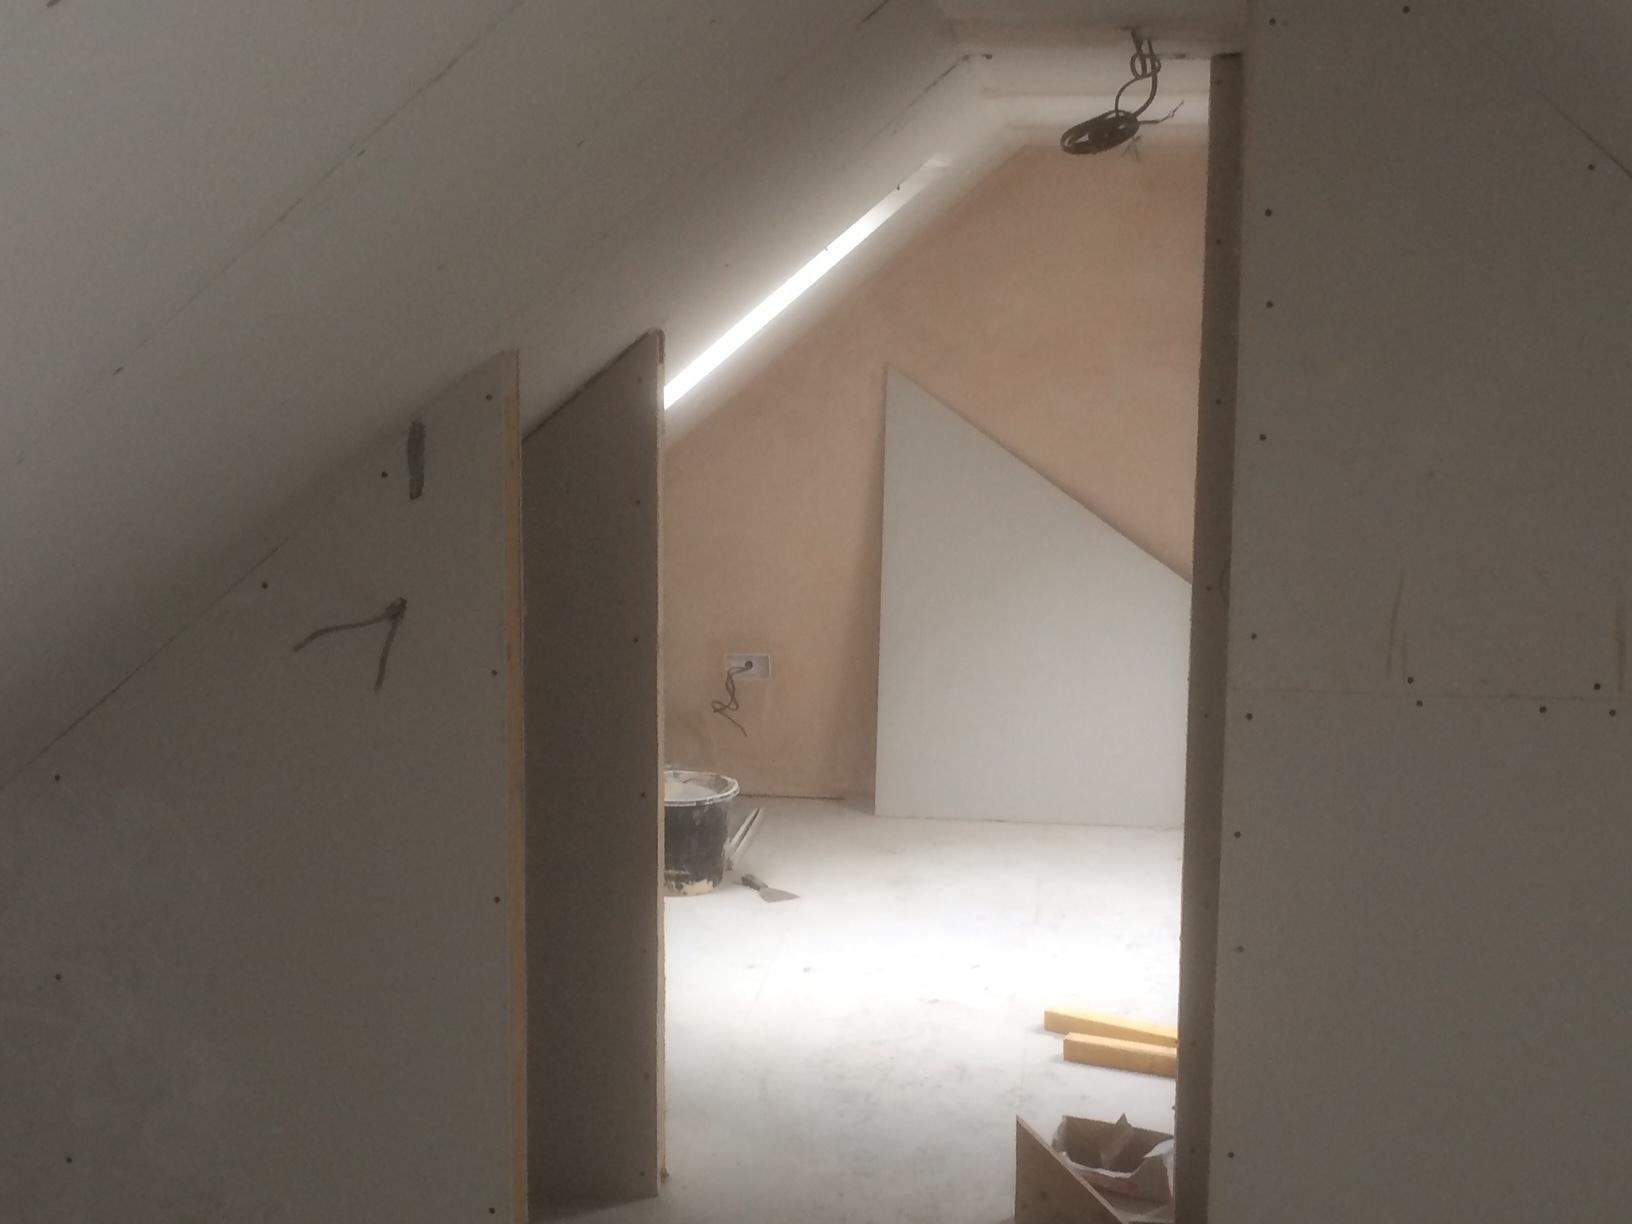 upstairs rooms coming along